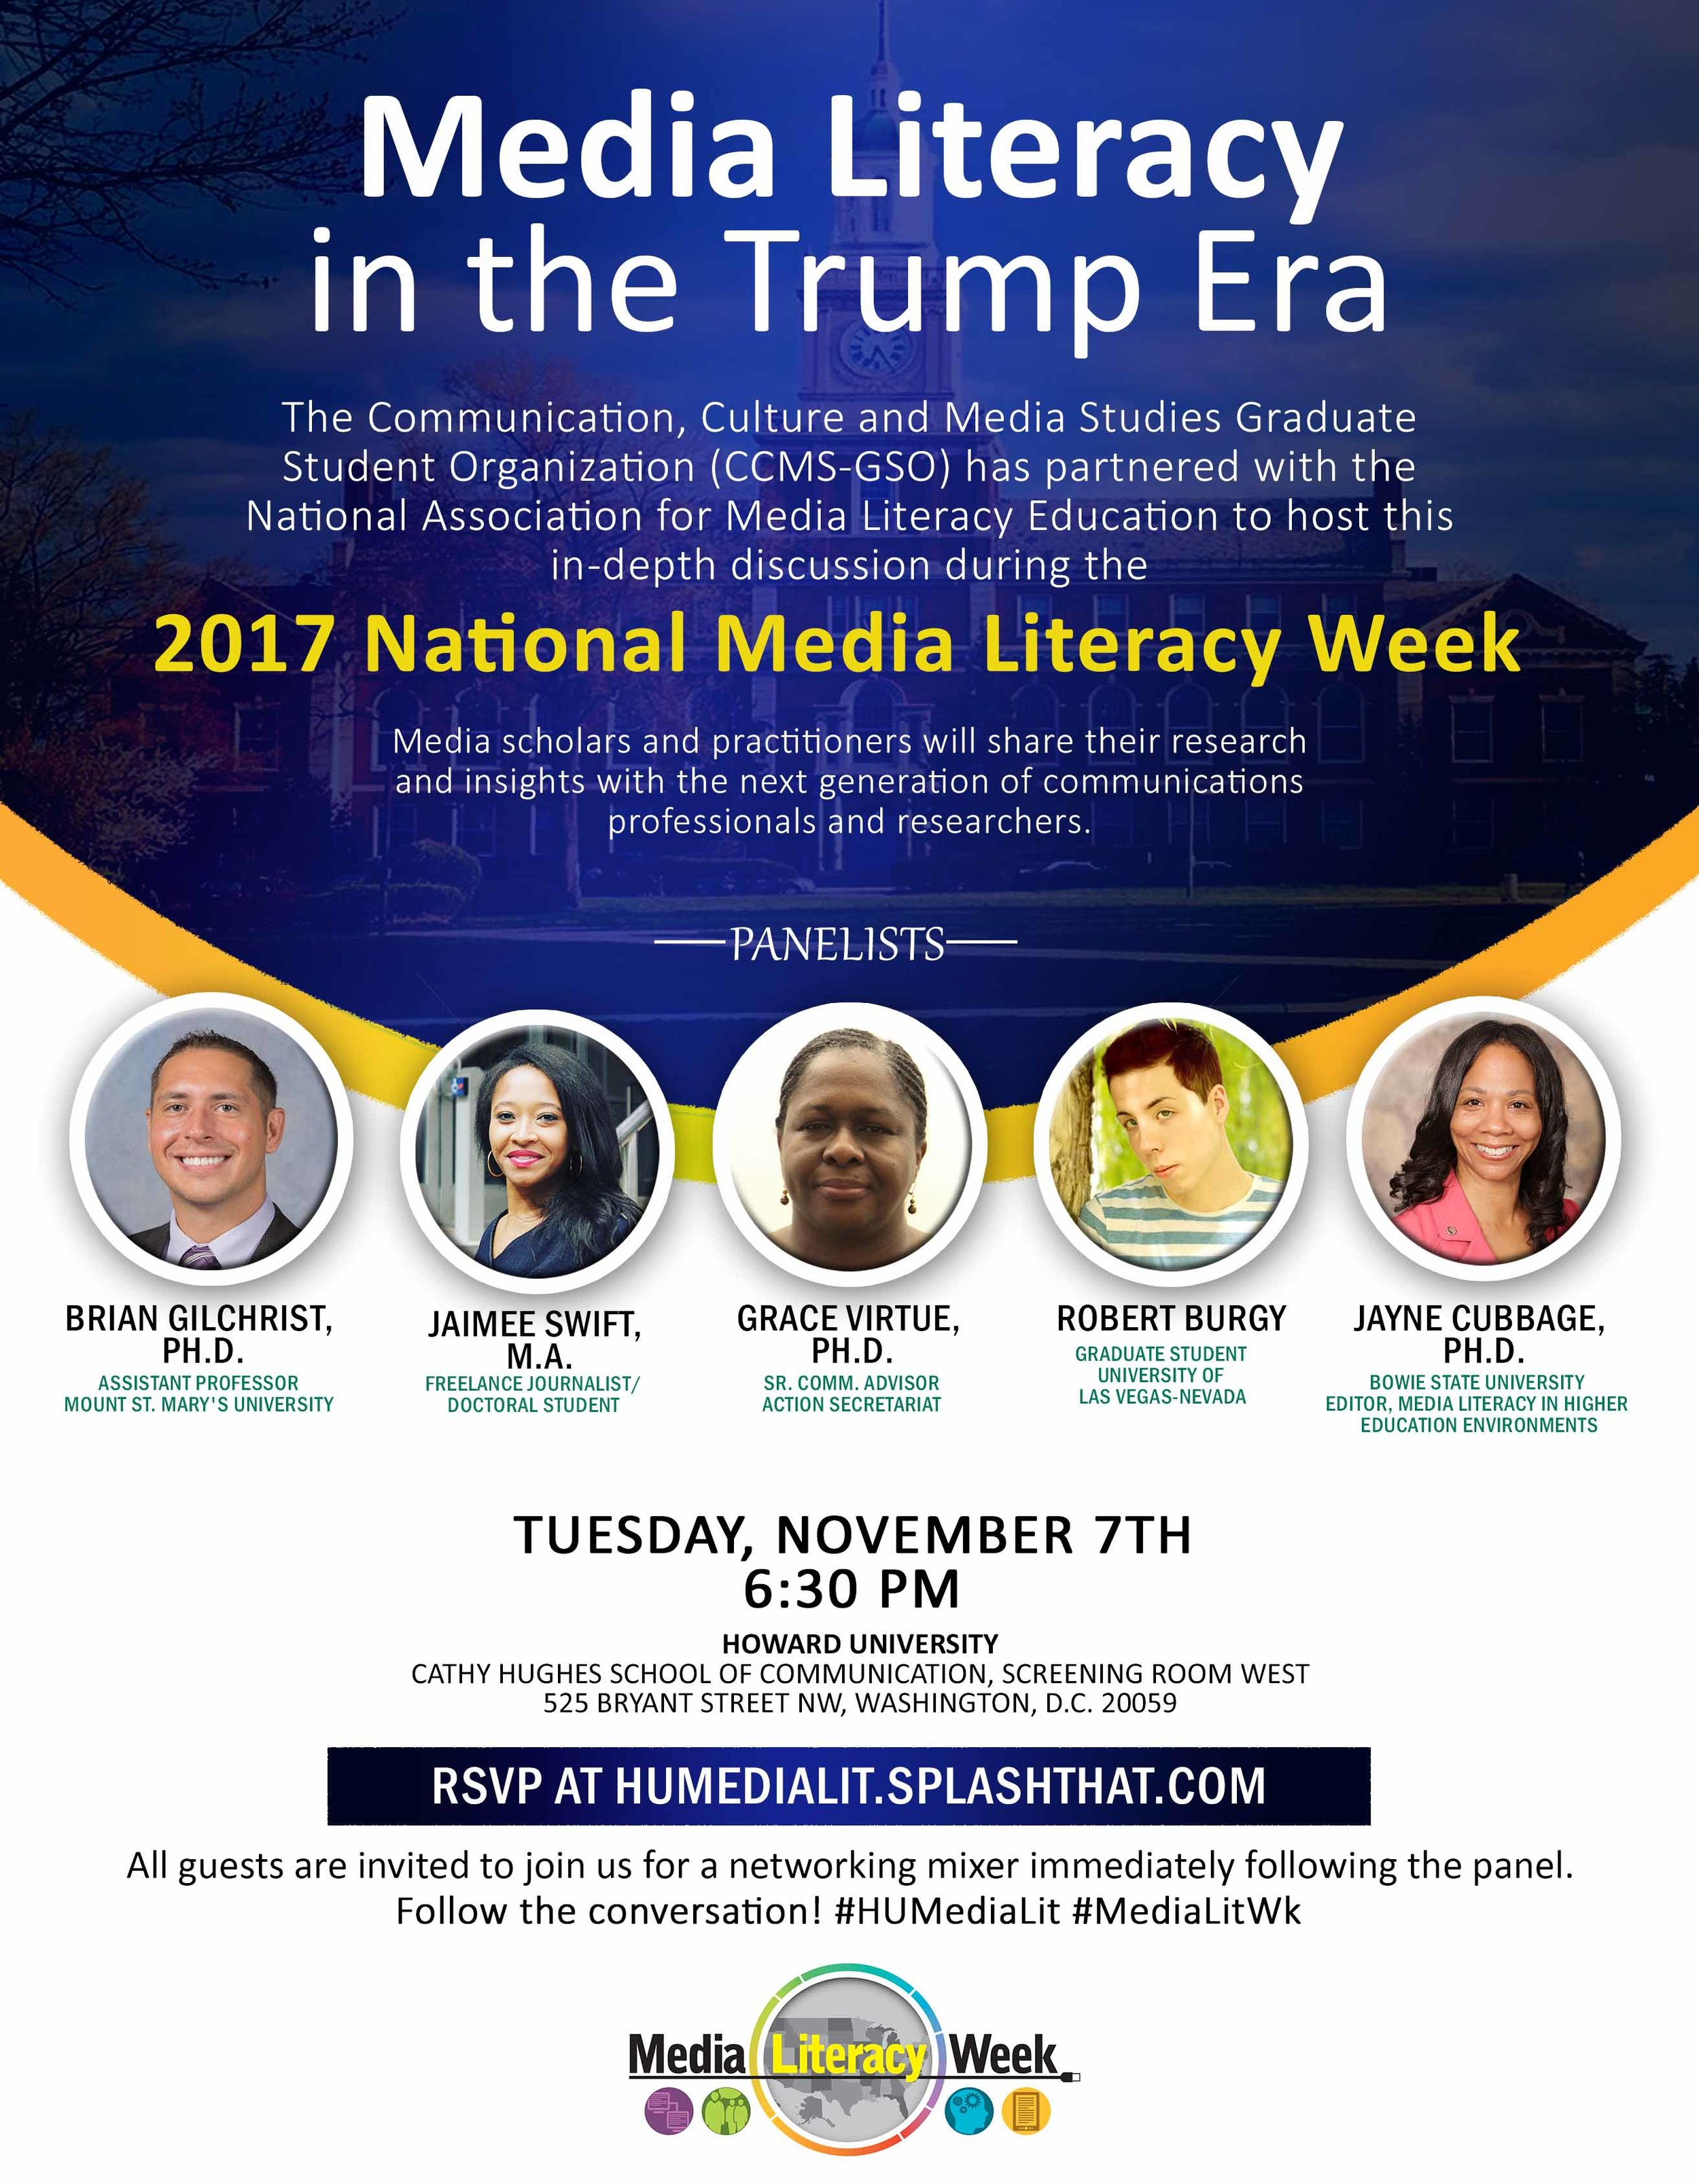 Event Organizer: Media Literacy in the Trump Era